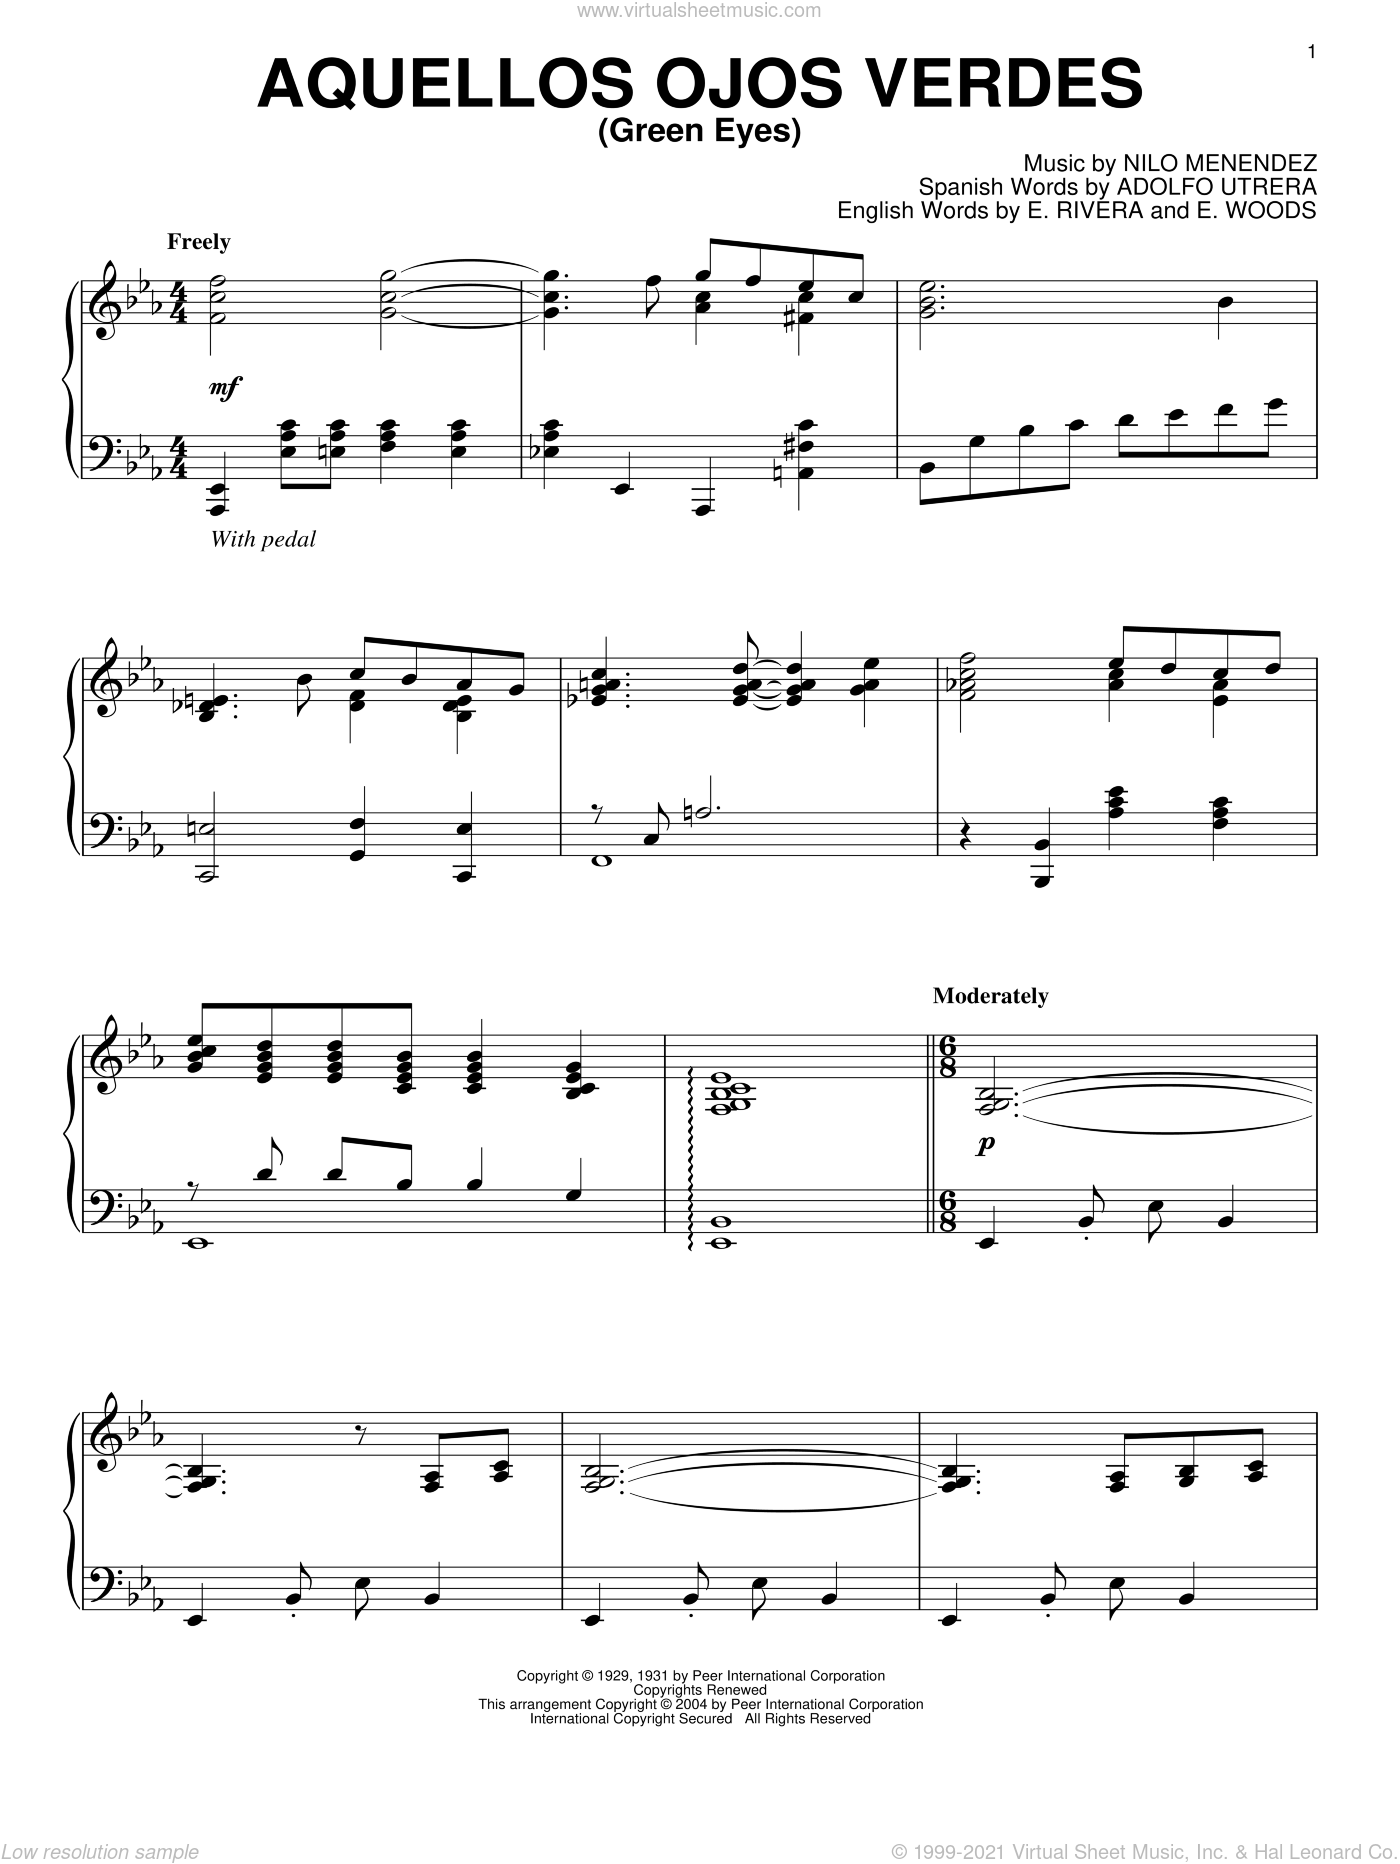 Aquellos Ojos Verdes (Green Eyes) sheet music for piano solo by Nilo Menendez, Adolfo Utrera, E. Rivera and E. Woods, intermediate skill level